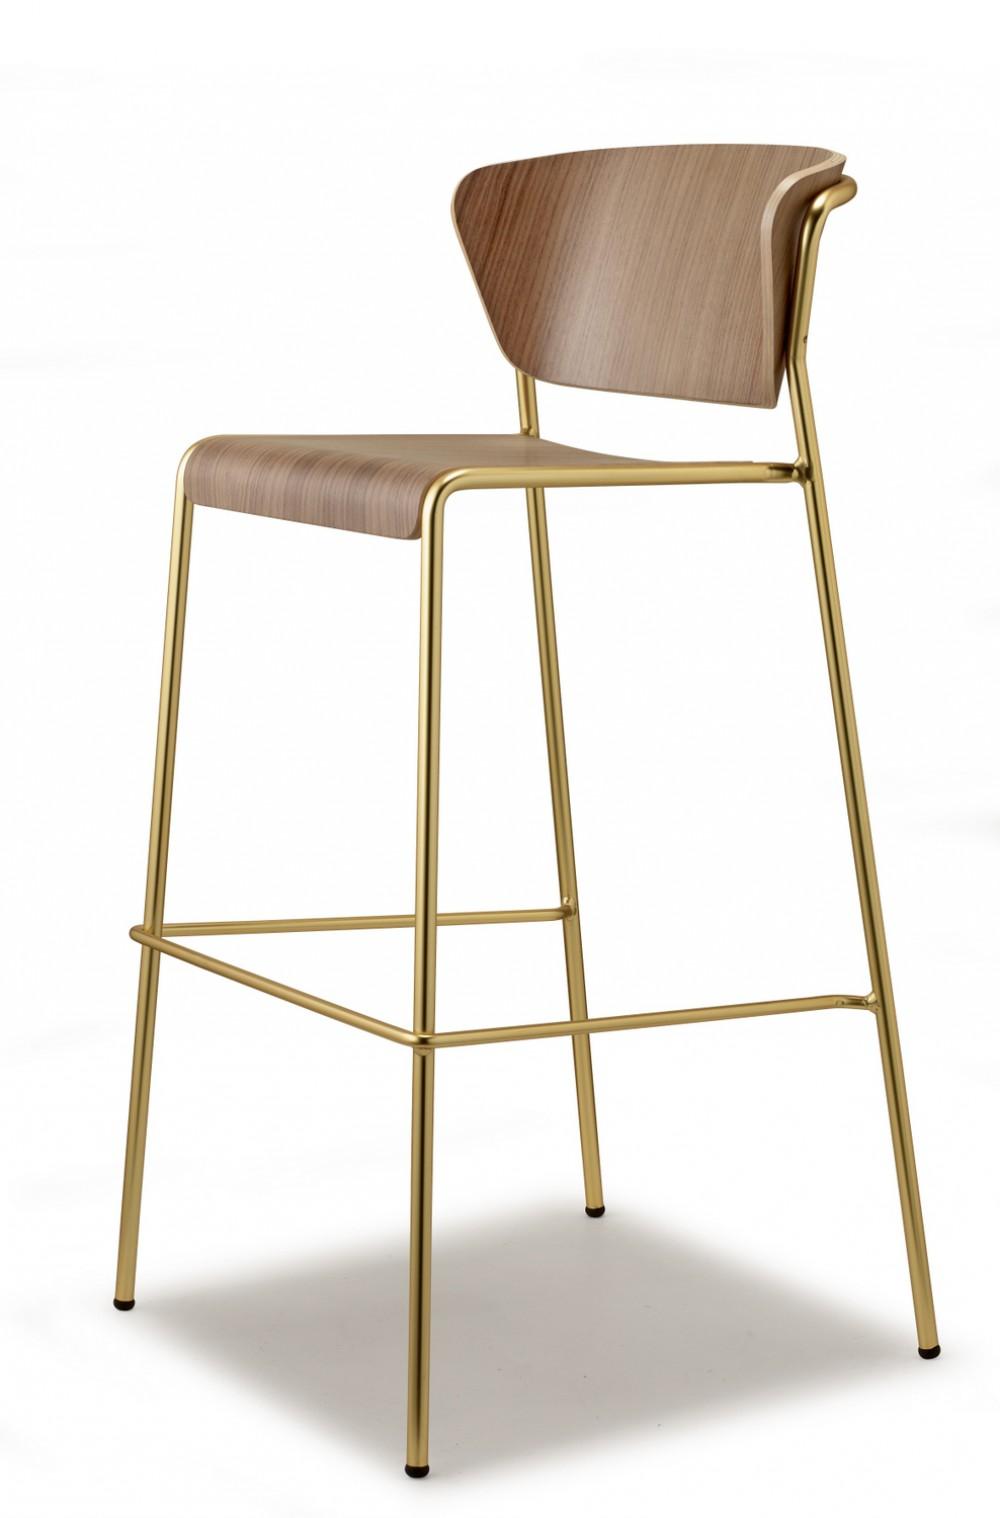 Design Barstuhl Gold Stuhl Stapelbar Barhocker Holz Natur Tresenstuhl